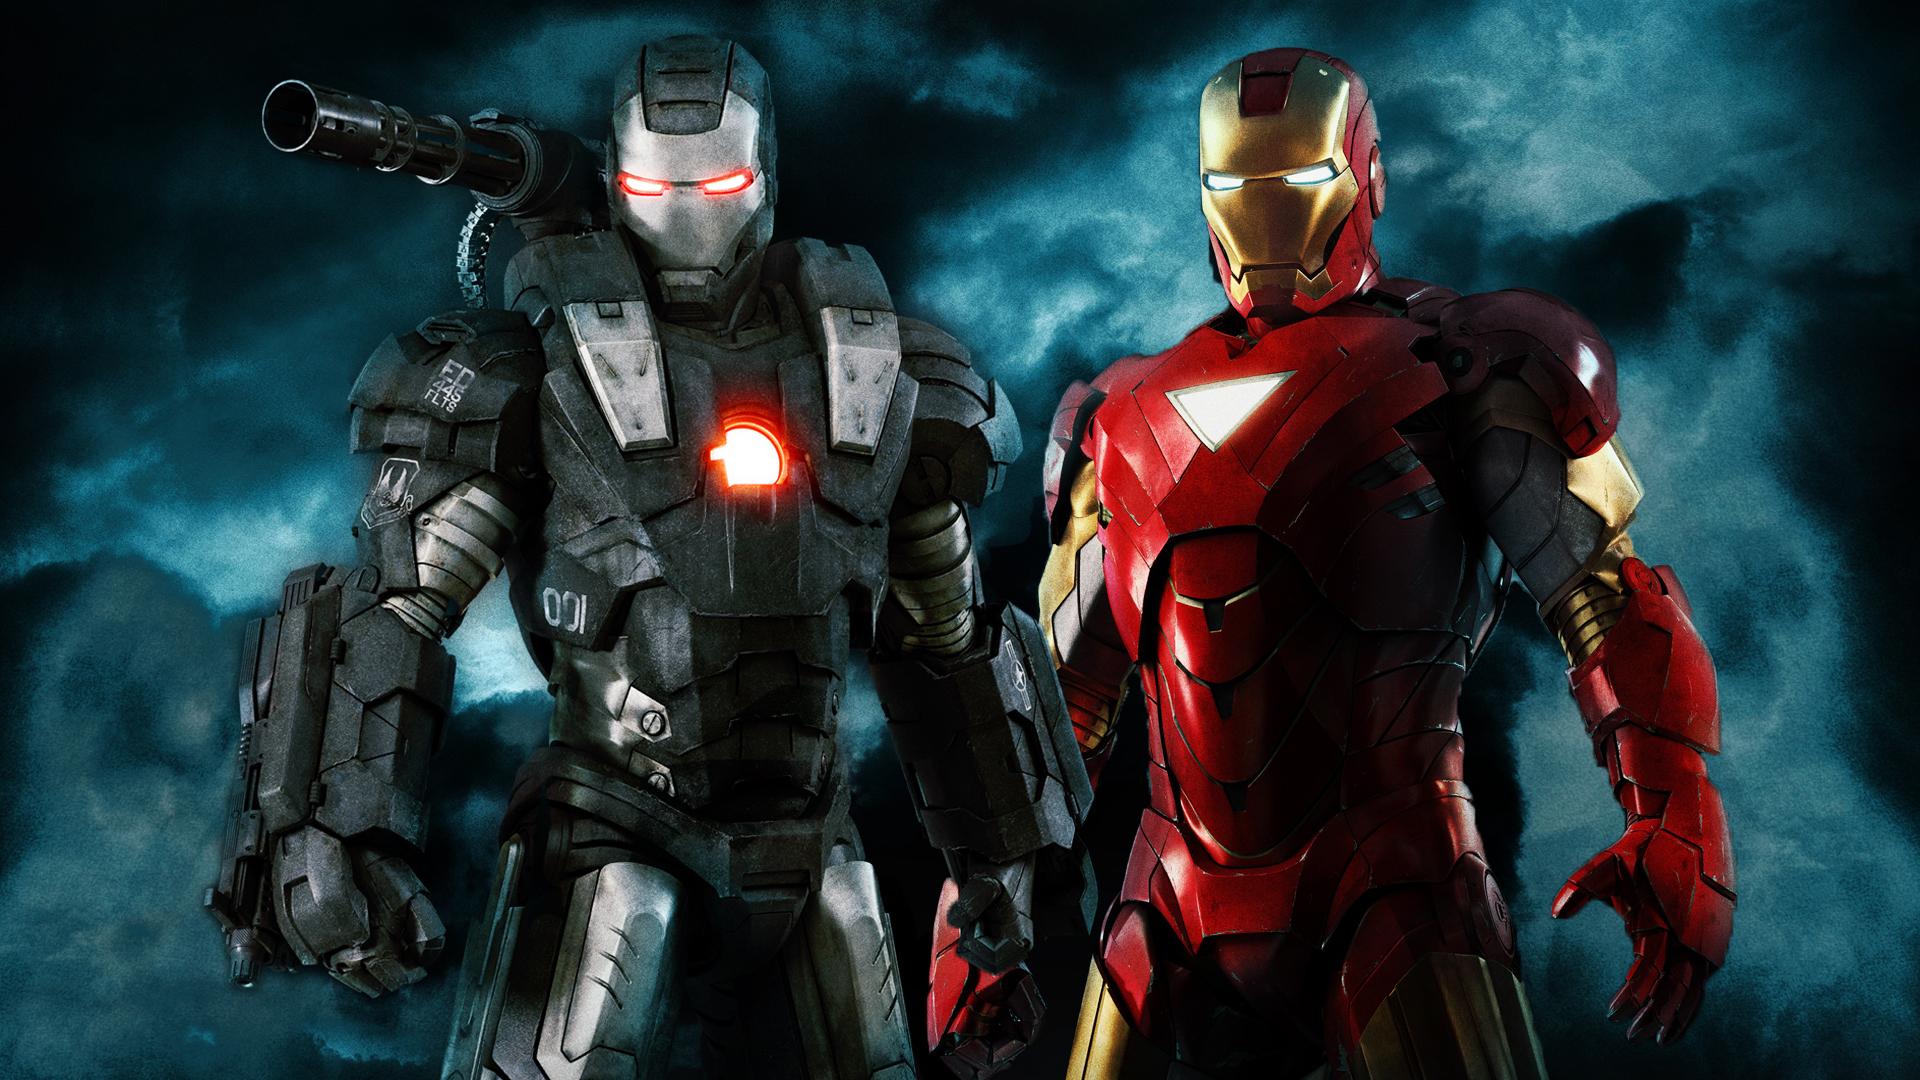 Iron man 2 full hd fond d 39 cran and arri re plan 1920x1080 id 226615 - Iron man telecharger ...